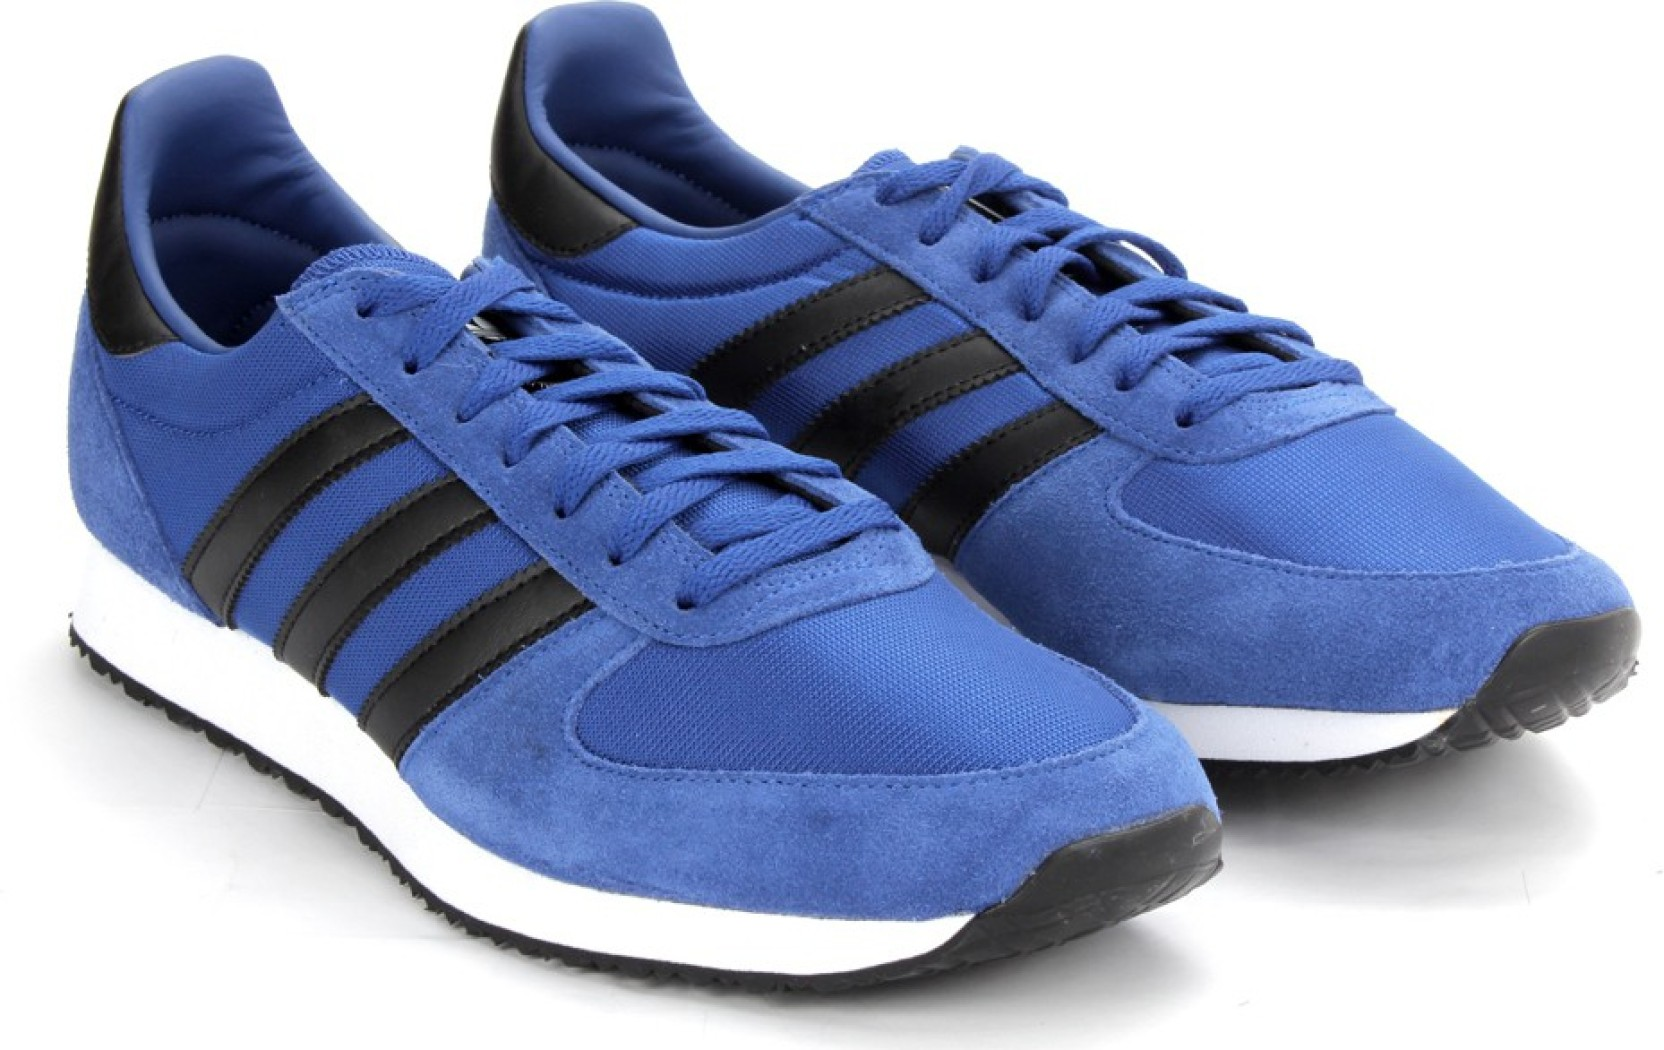 Adidas Originals Zx Racer Sneakers For Men Buy Croyal Cblack Blue Black Home